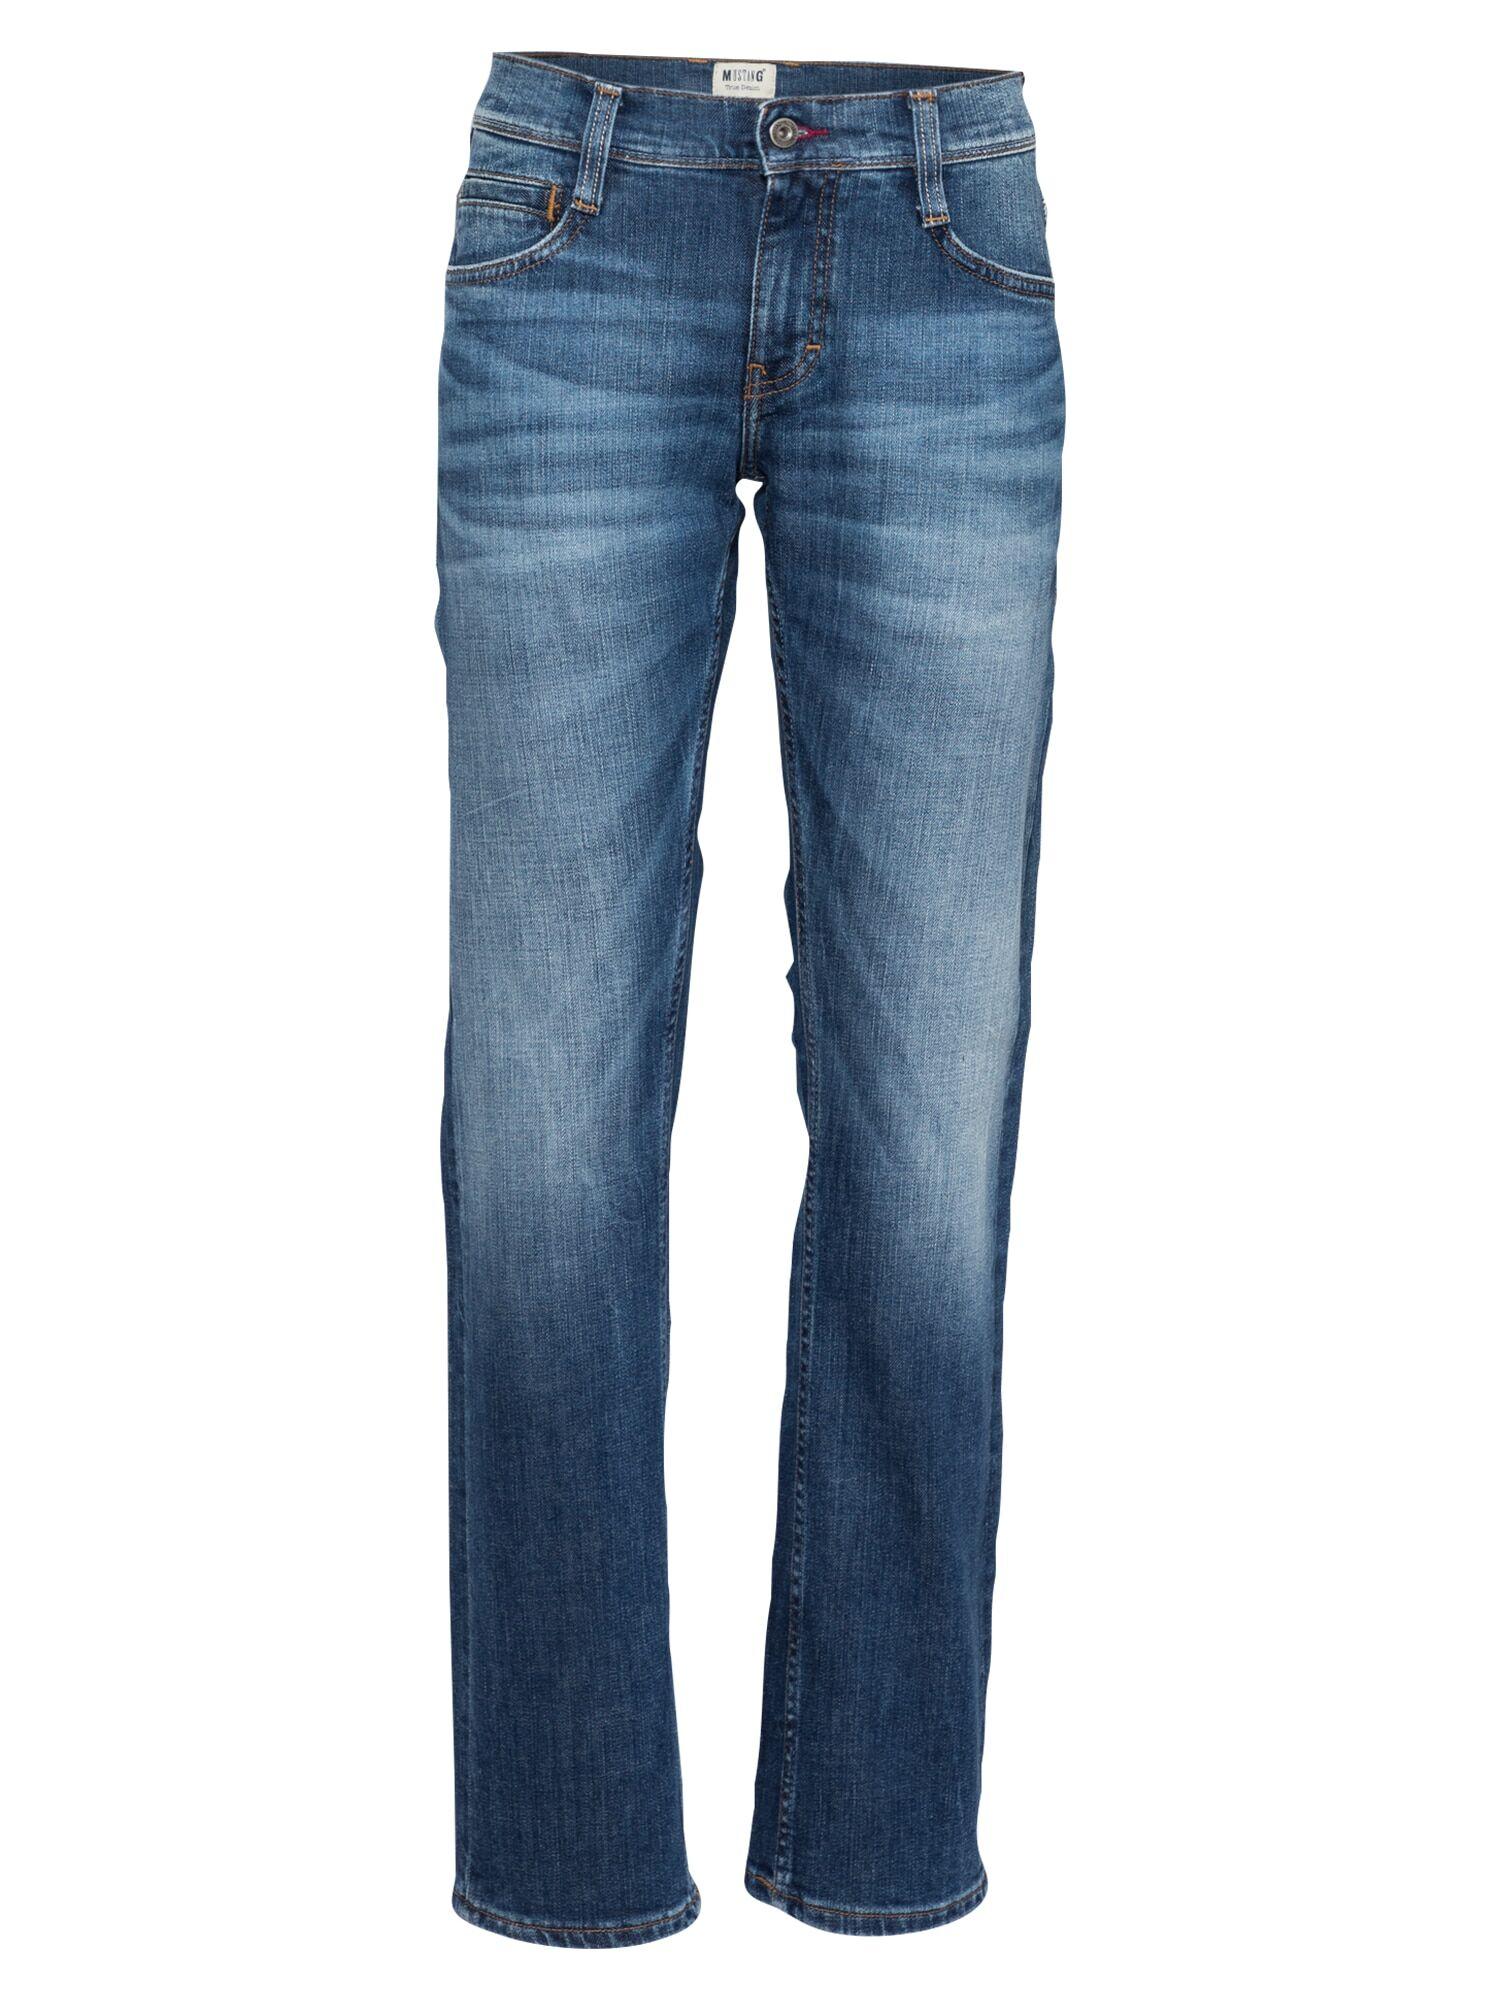 MUSTANG Jean 'Oregon '  - Bleu - Taille: 29/34 - male